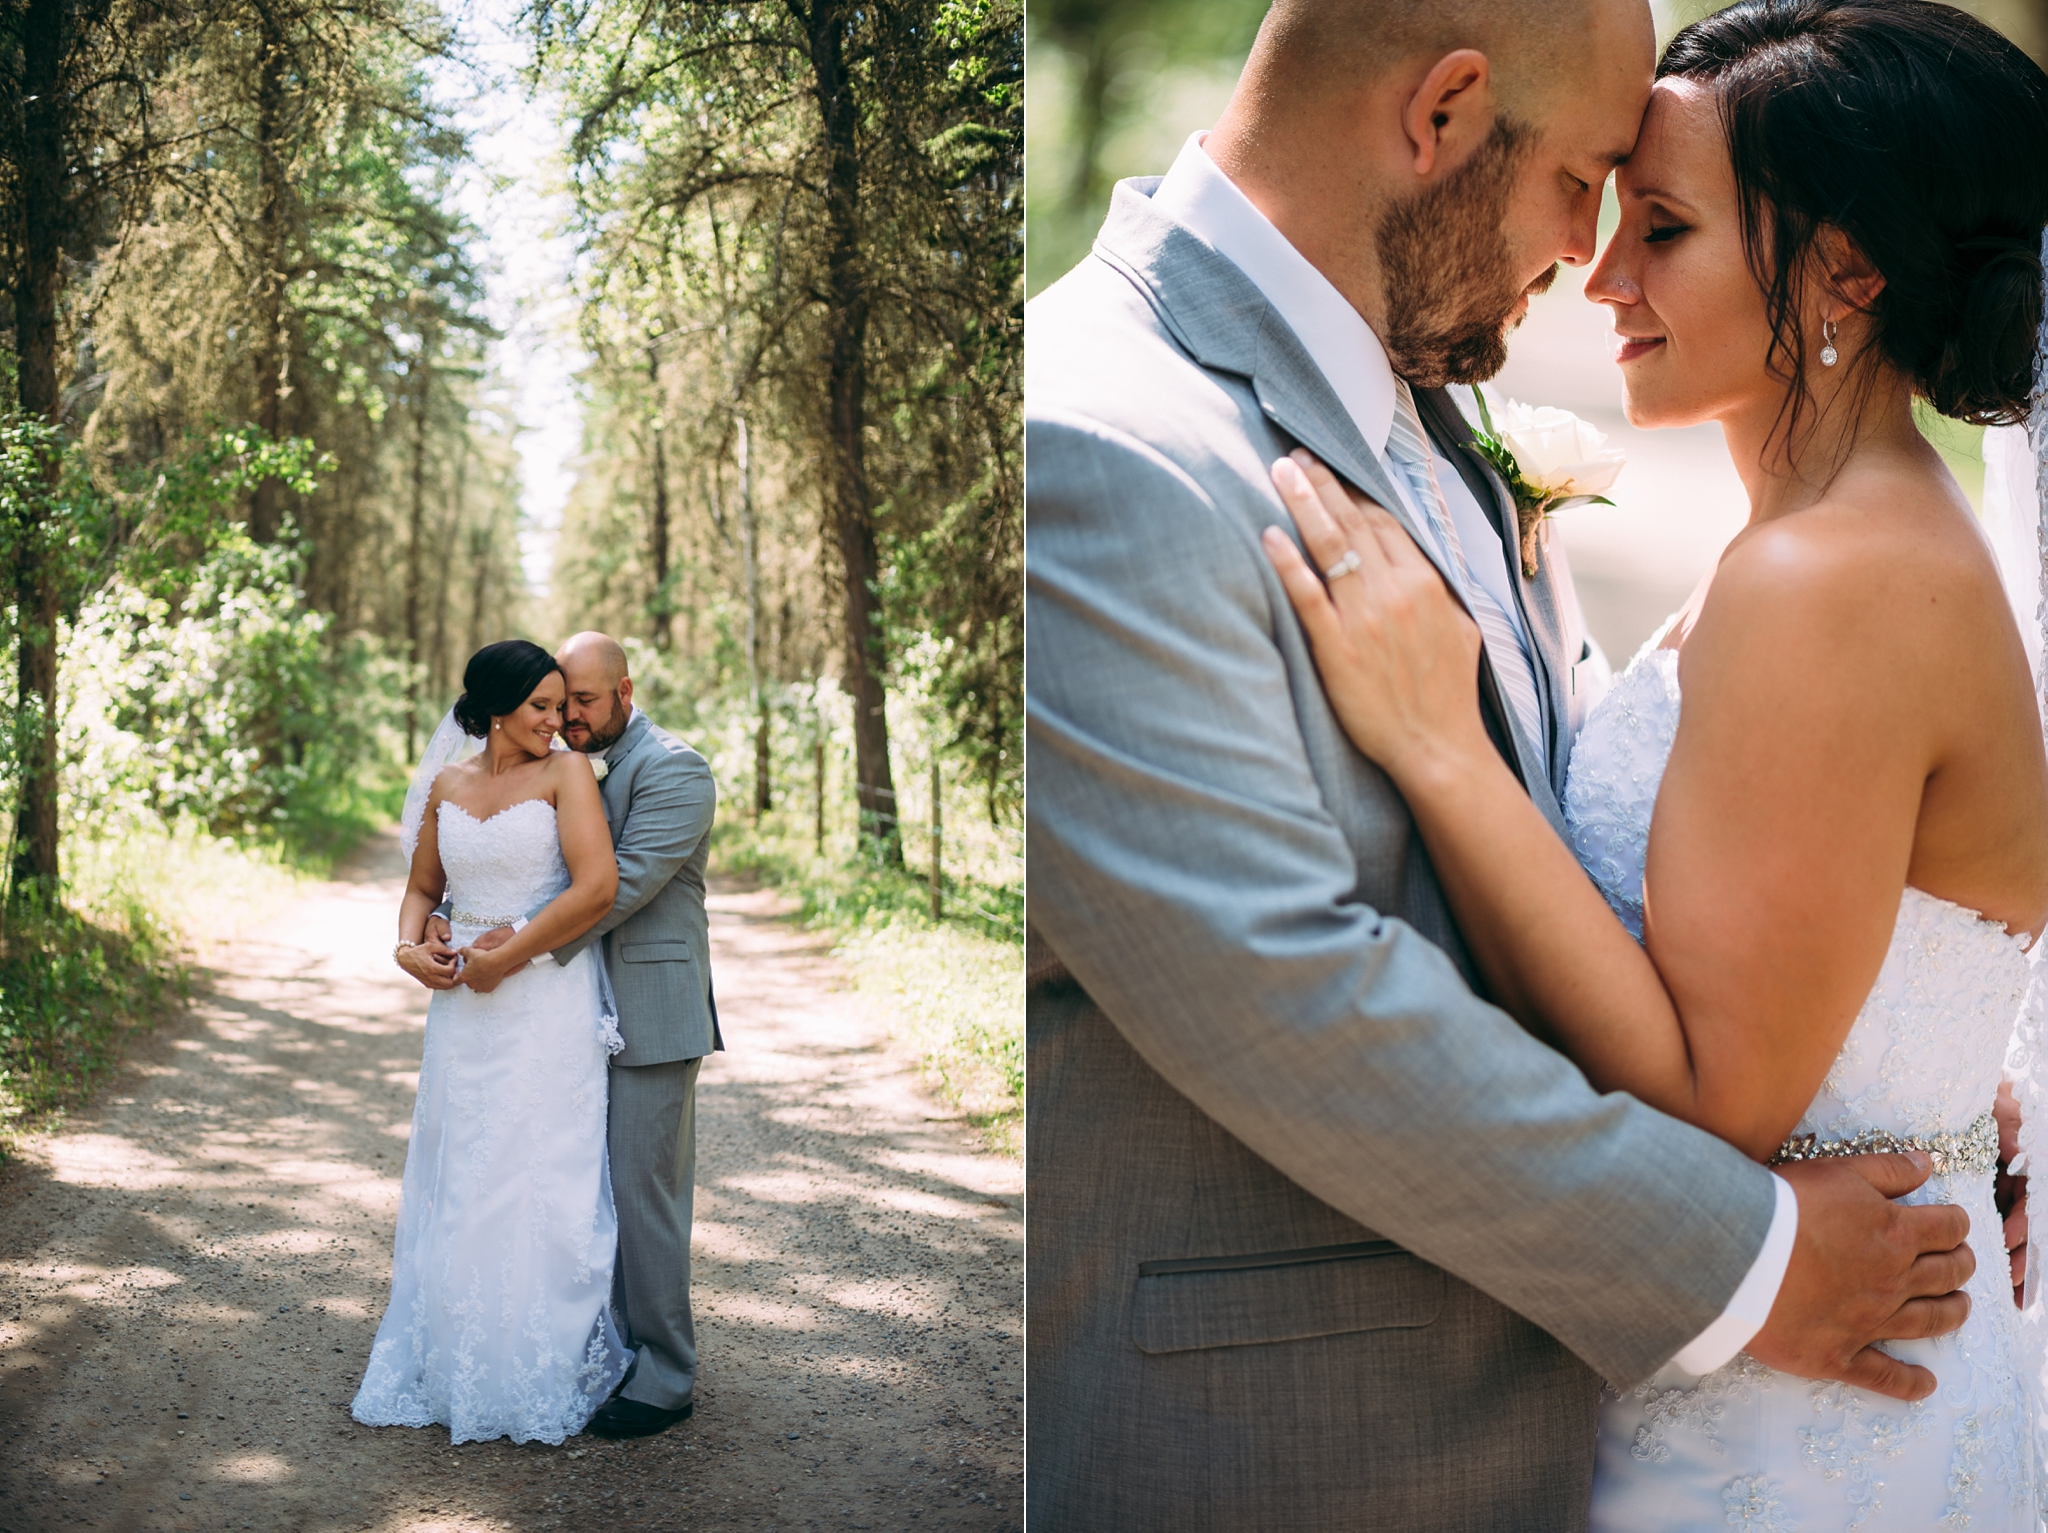 kaihla_tonai_intimate_wedding_elopement_photographer_1537